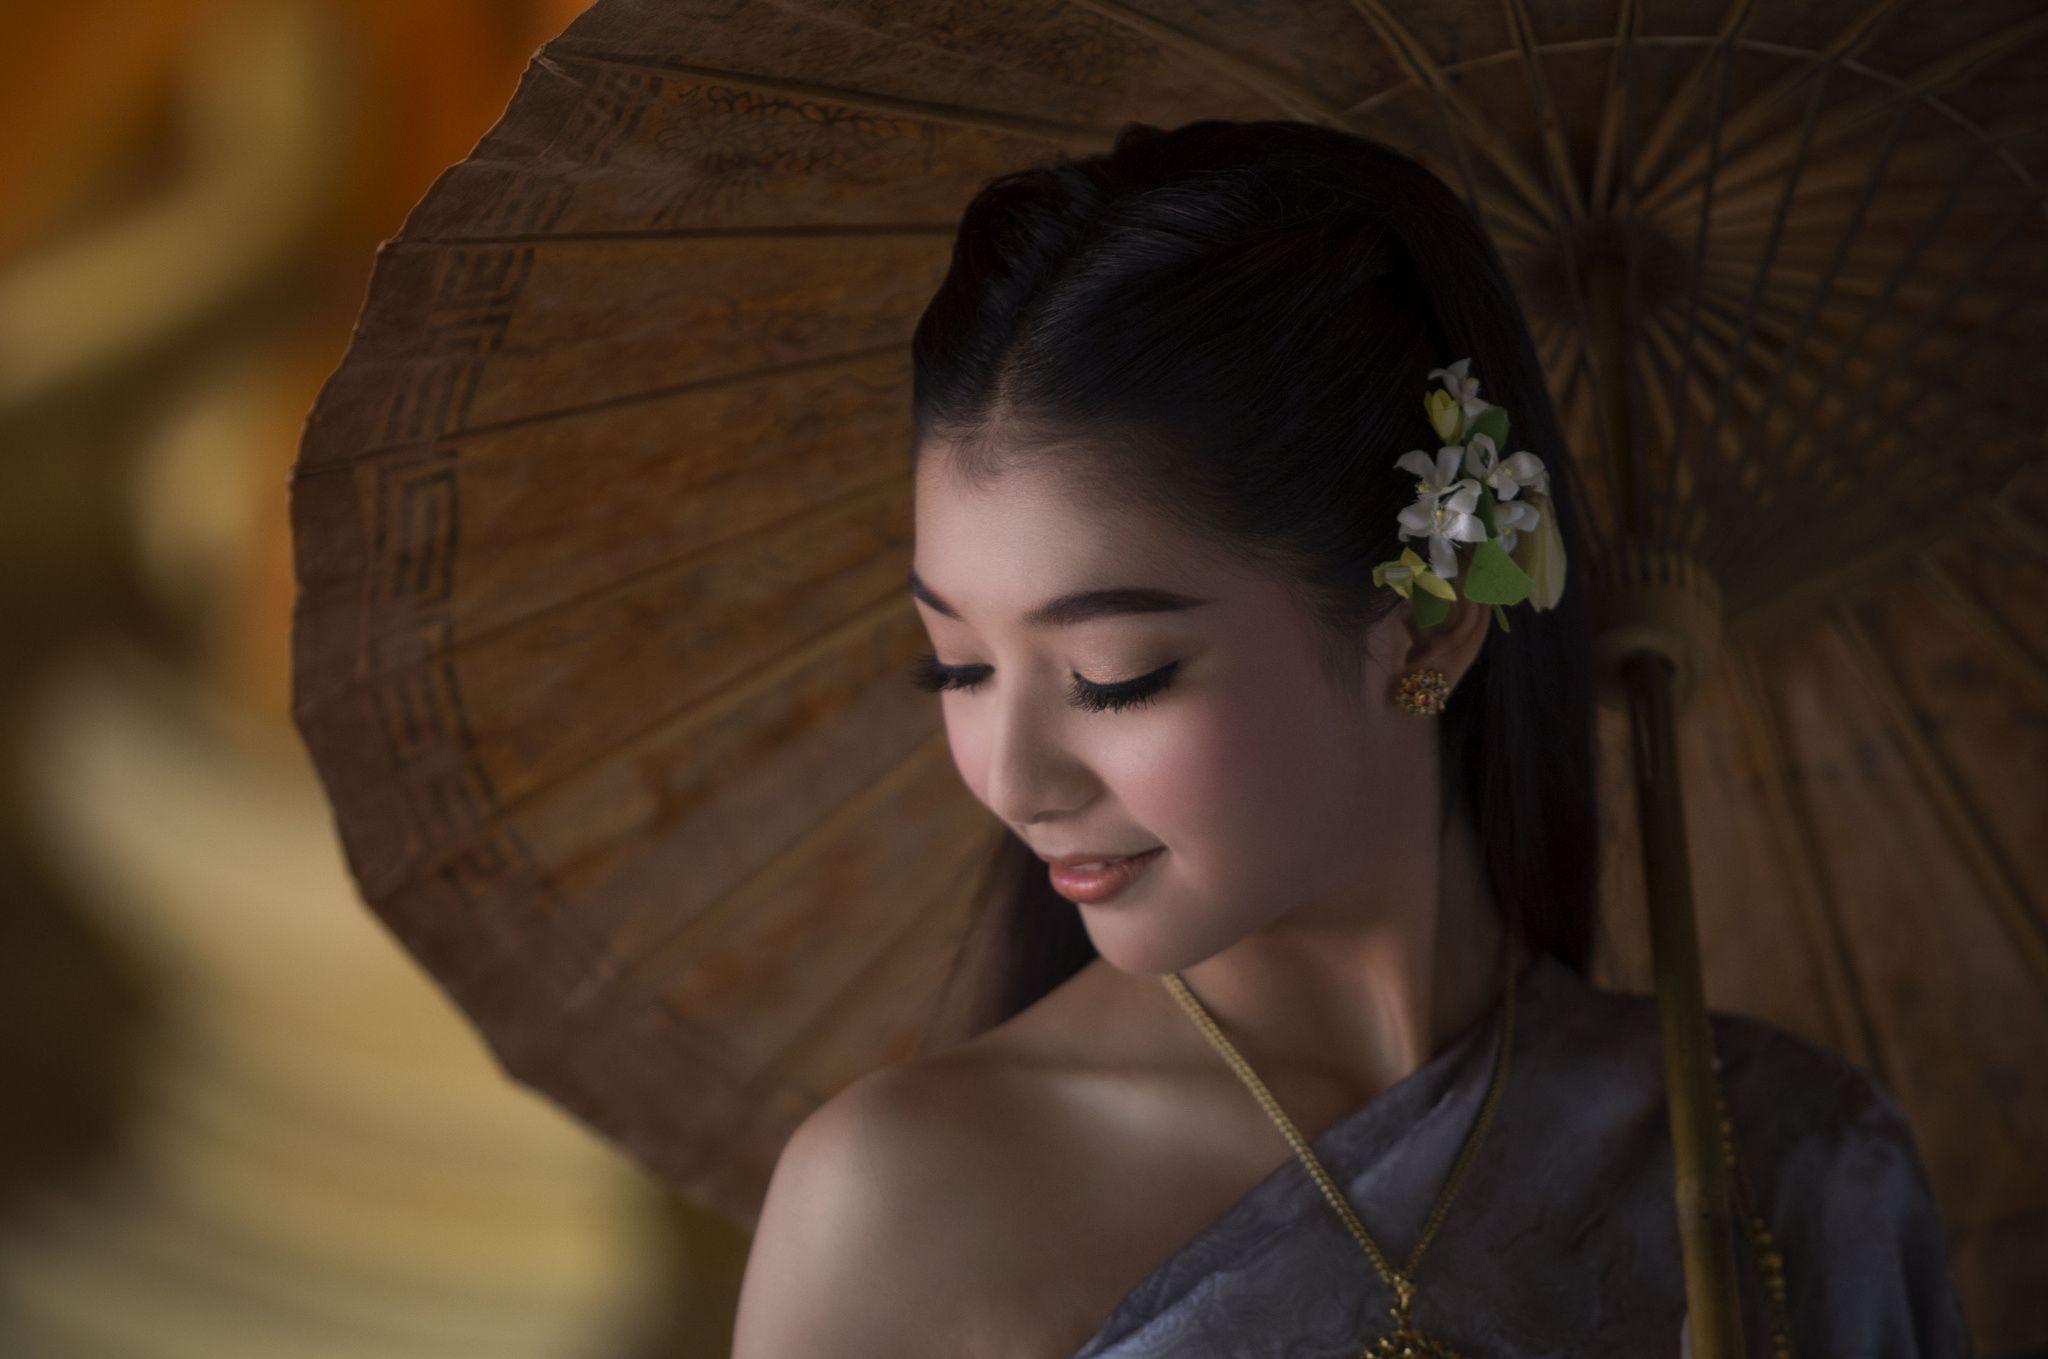 https://bridessumo.com/wp-content/uploads/2020/01/Thai-Girl-for-Marriage1.jpg